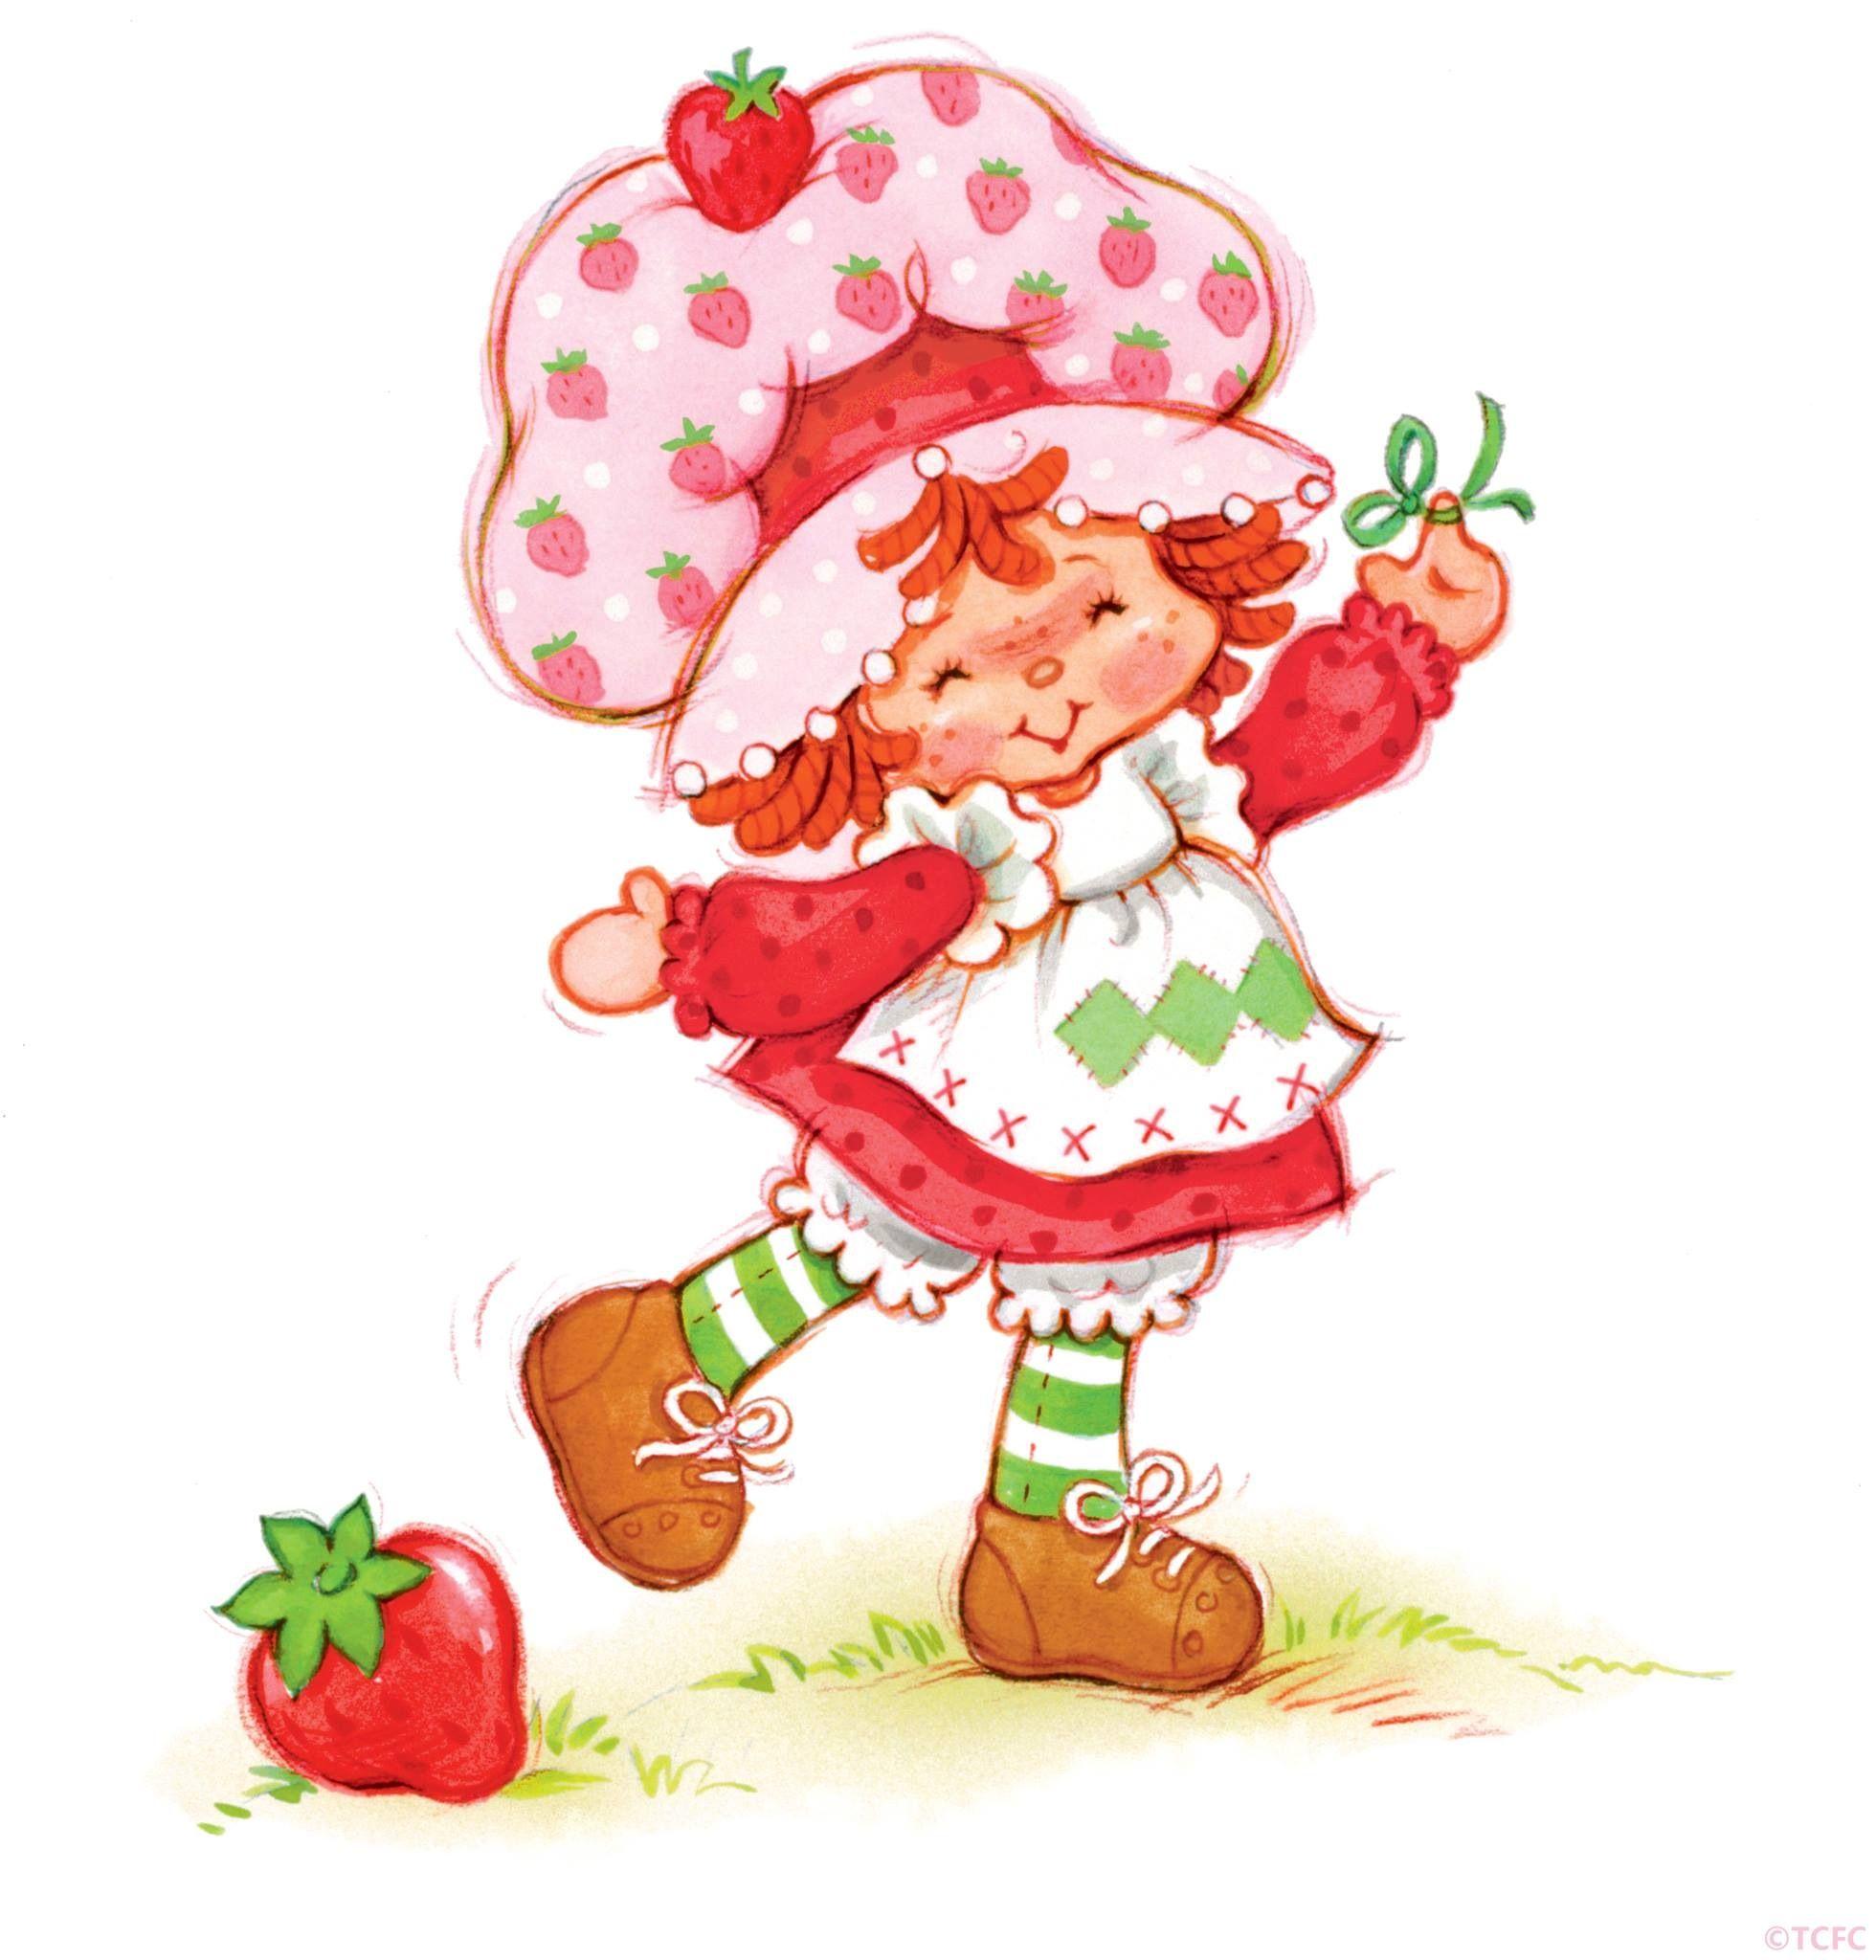 Strawberry shortcake   STRAWBERRY SHORTCAKE   Pinterest